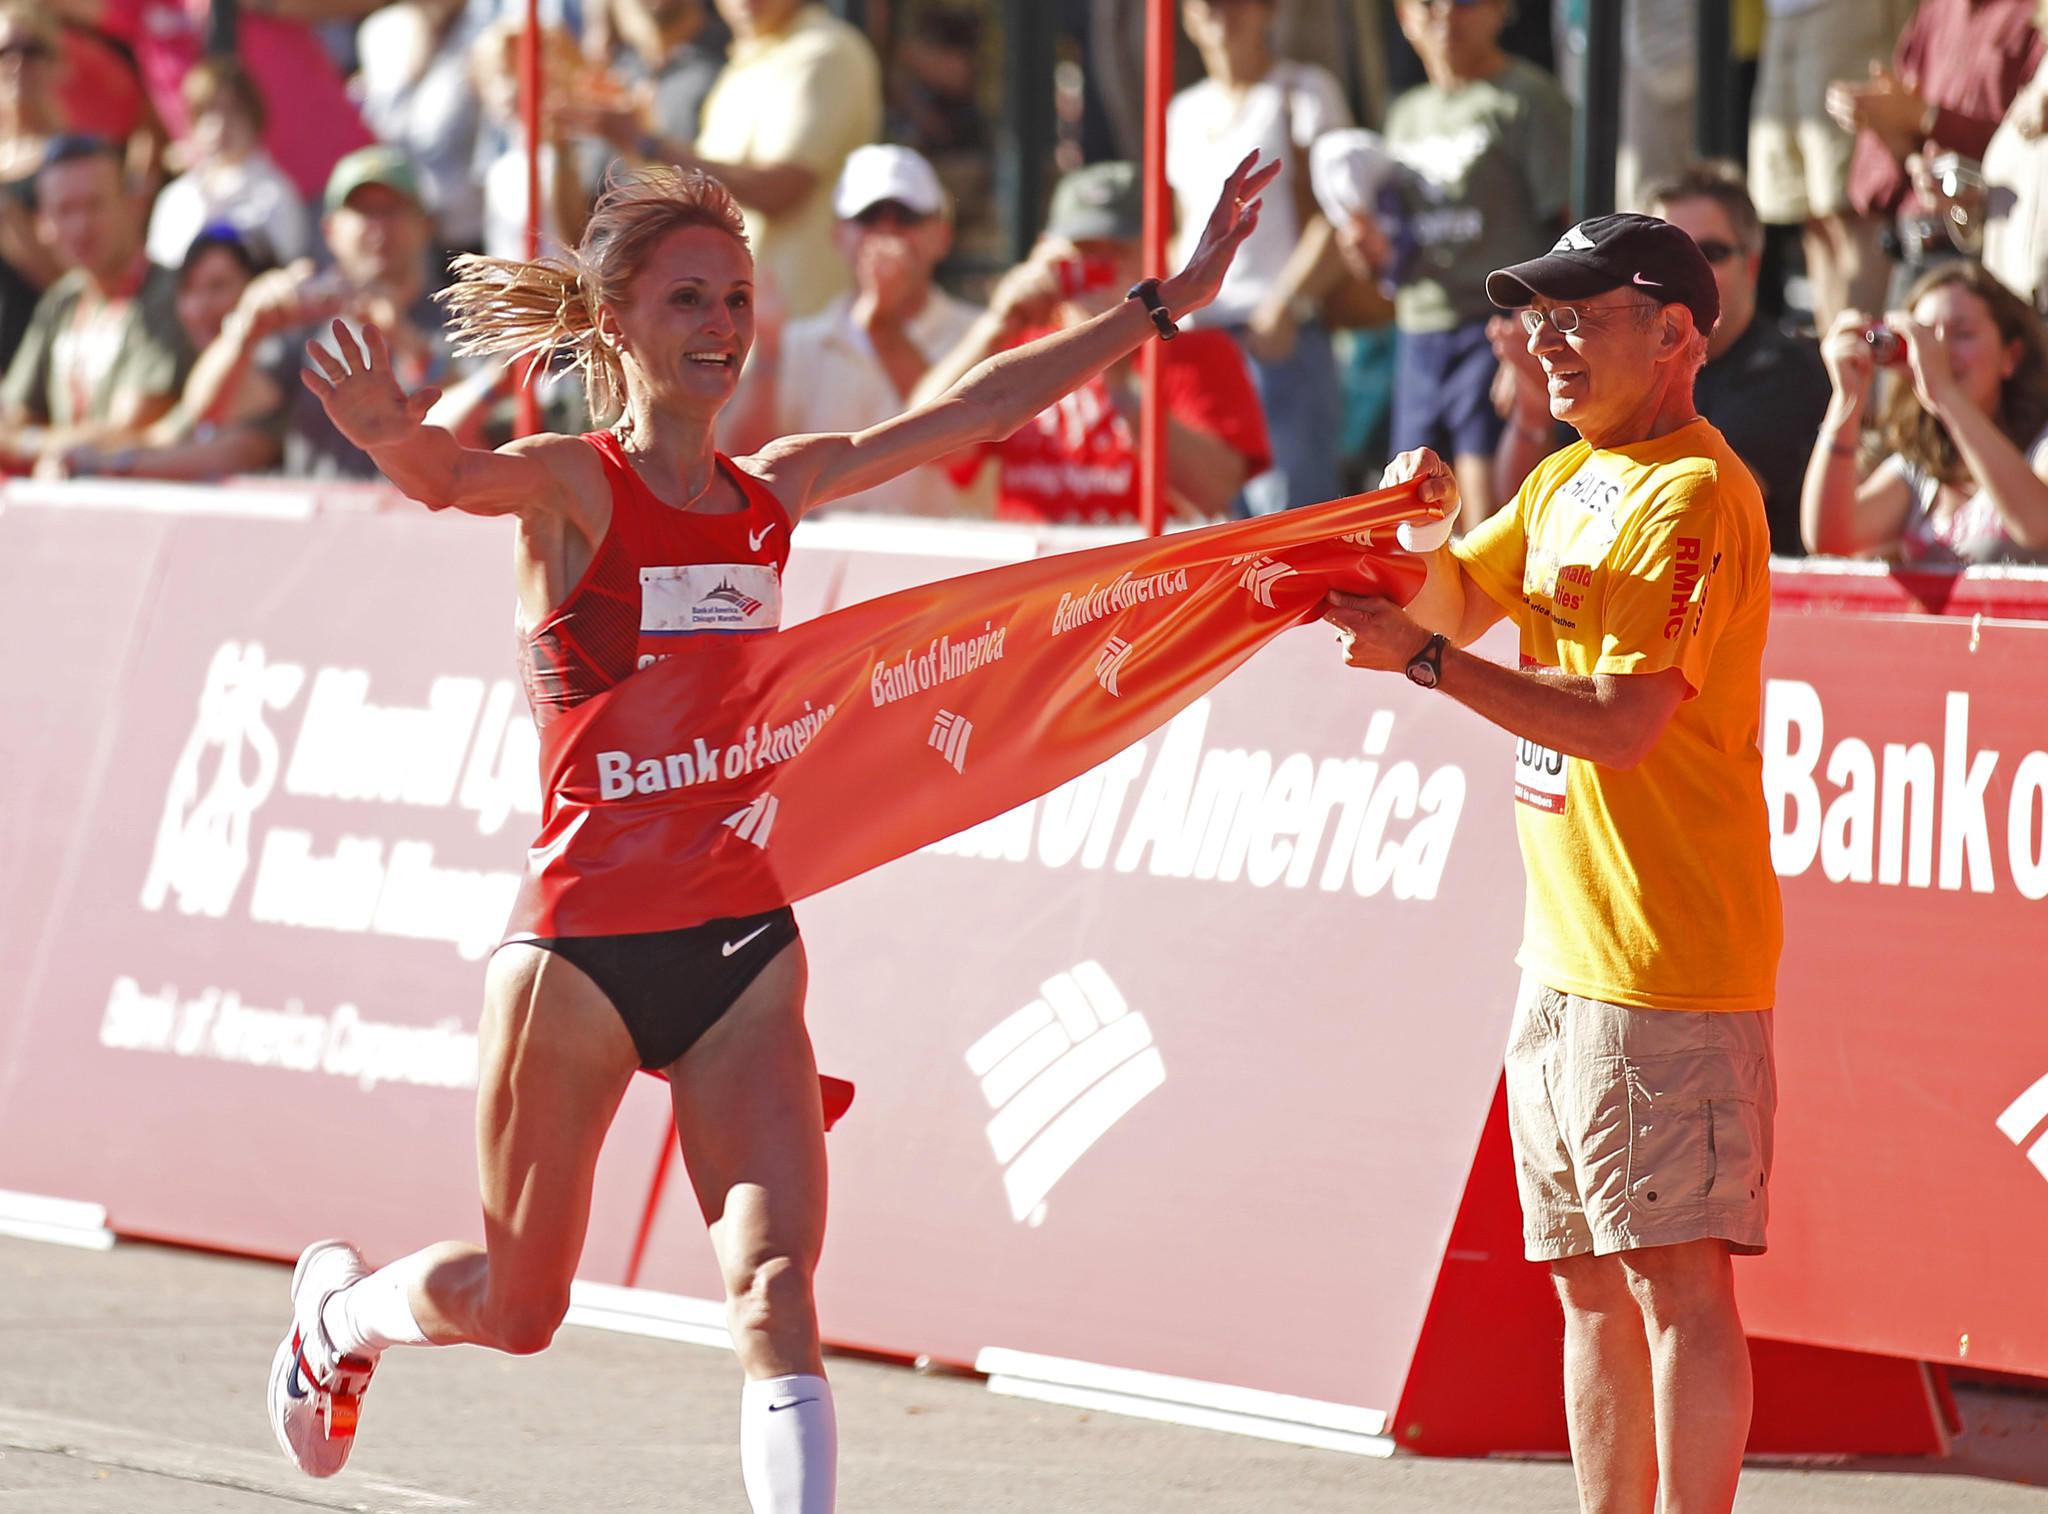 Women's winner, Liliya Shobukhova, Russia, crosses the finish line at the Bank of America Chicago Marathon, along Columbus Drive in Grant Park, October 9, 2011